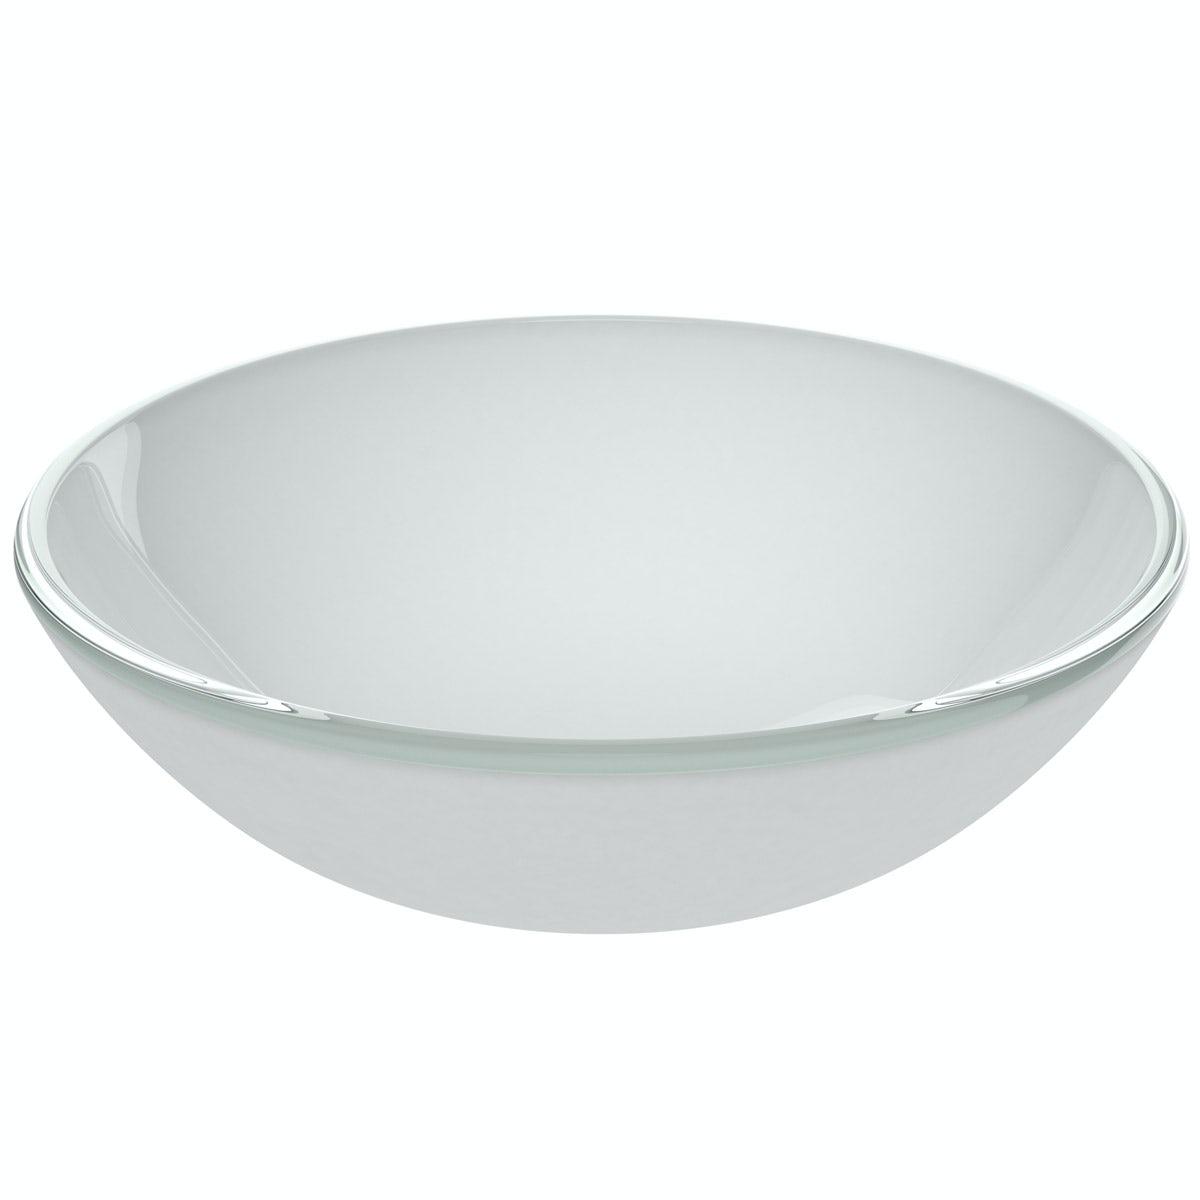 Mode Mackintosh painted white glass countertop basin 420mm